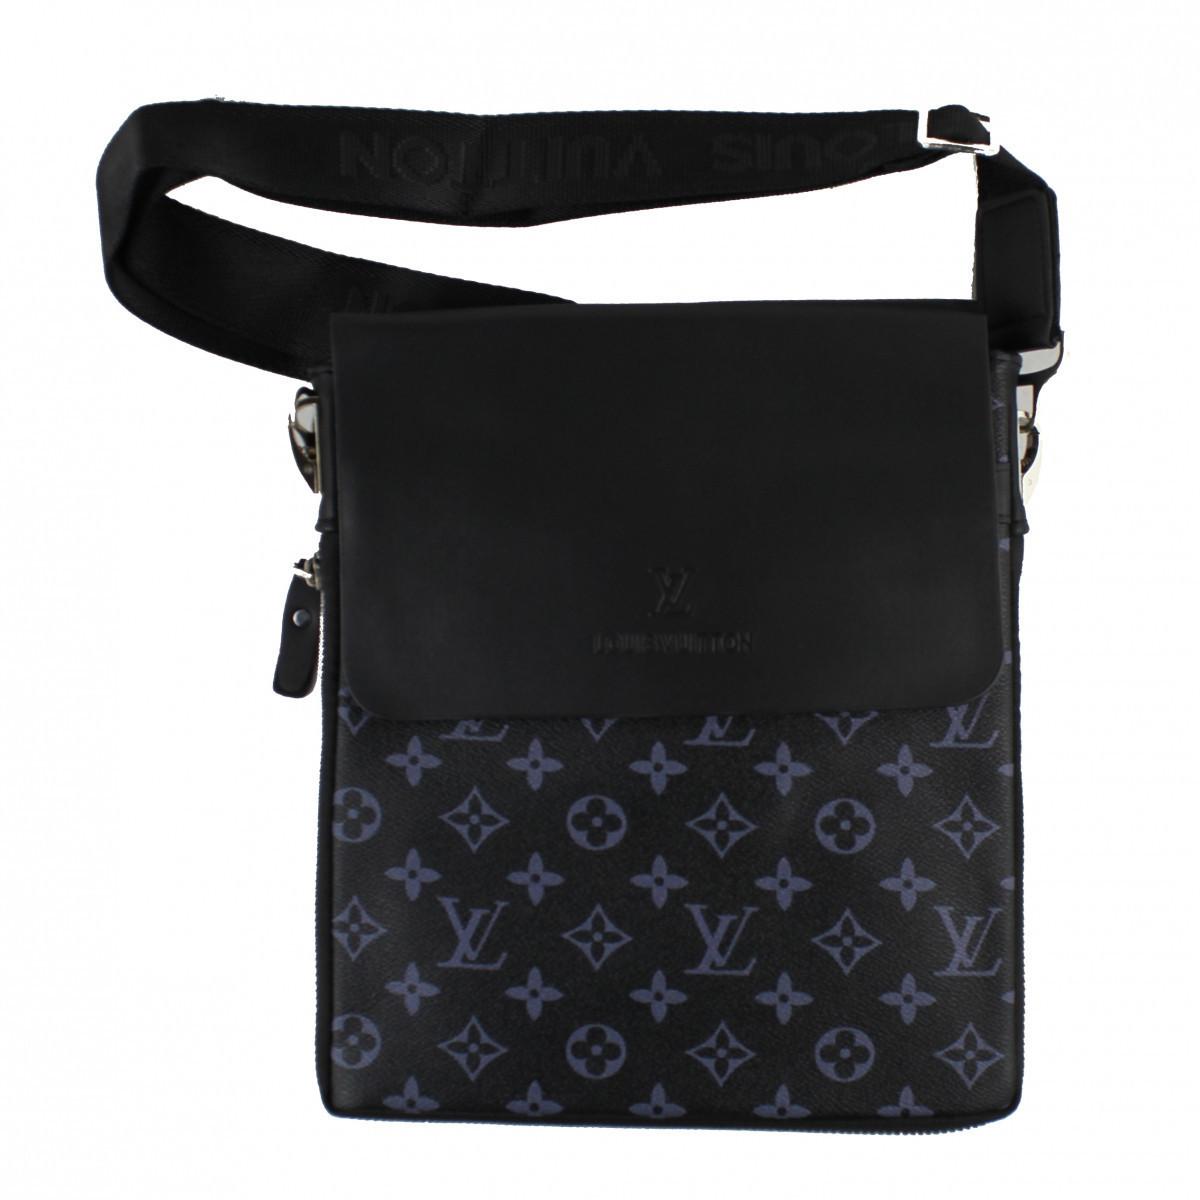 c90347e5b892 Мужская сумка планшет Louis Vuitton - Интернет-магазин xMarket.com.ua в  Одессе